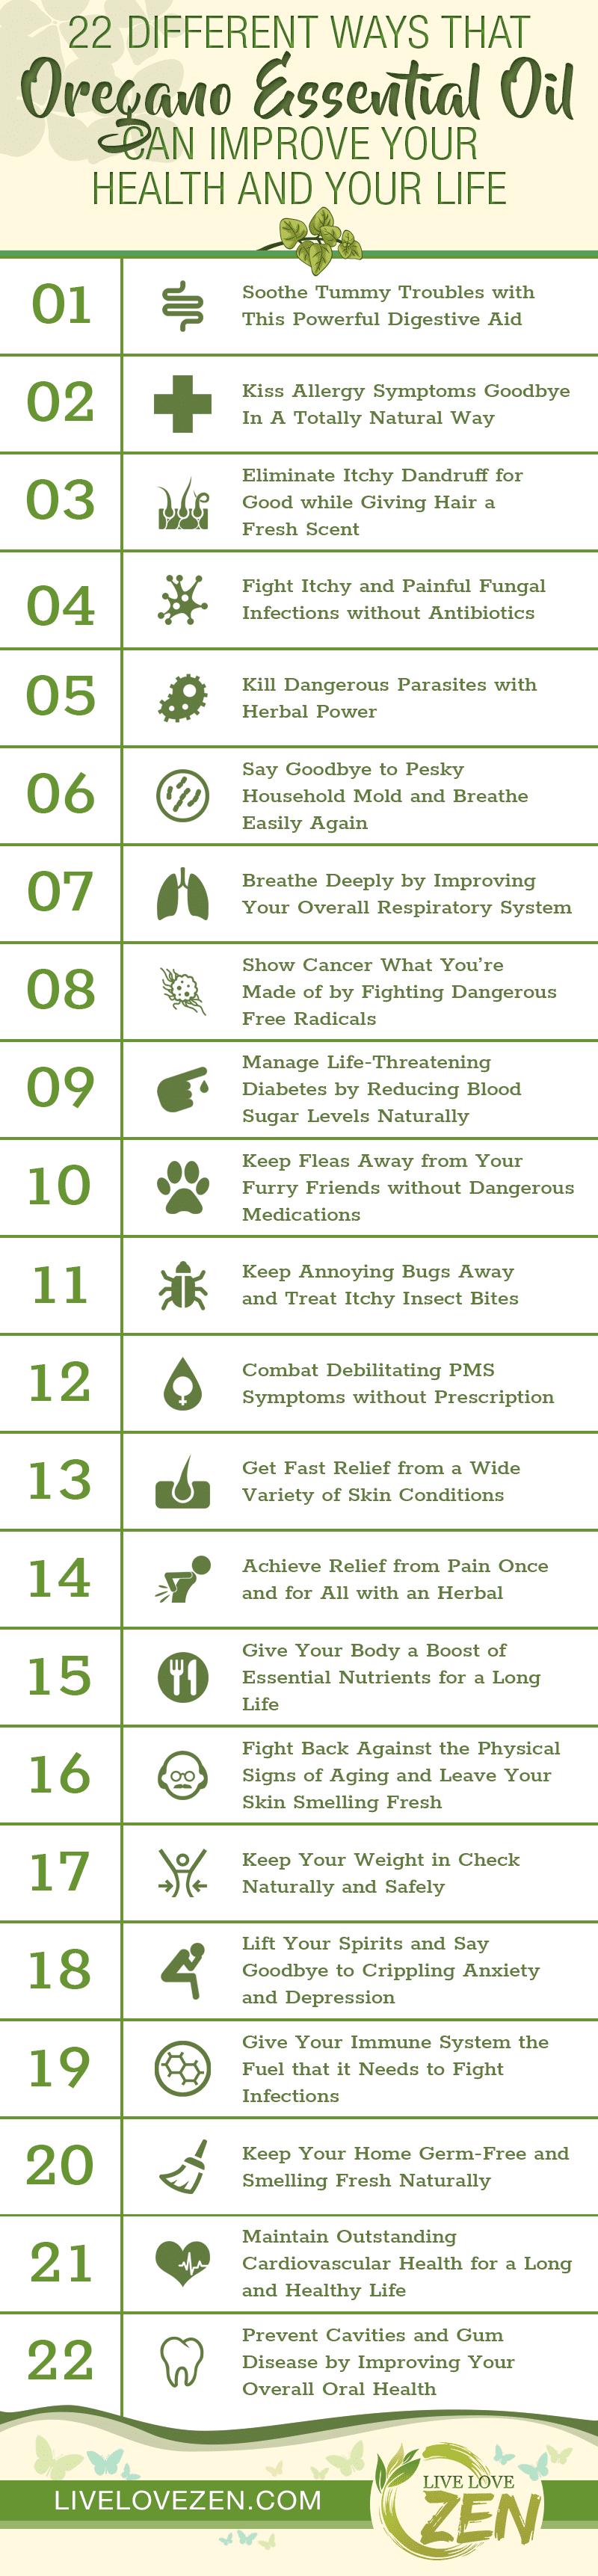 oregano essential oil health benefits